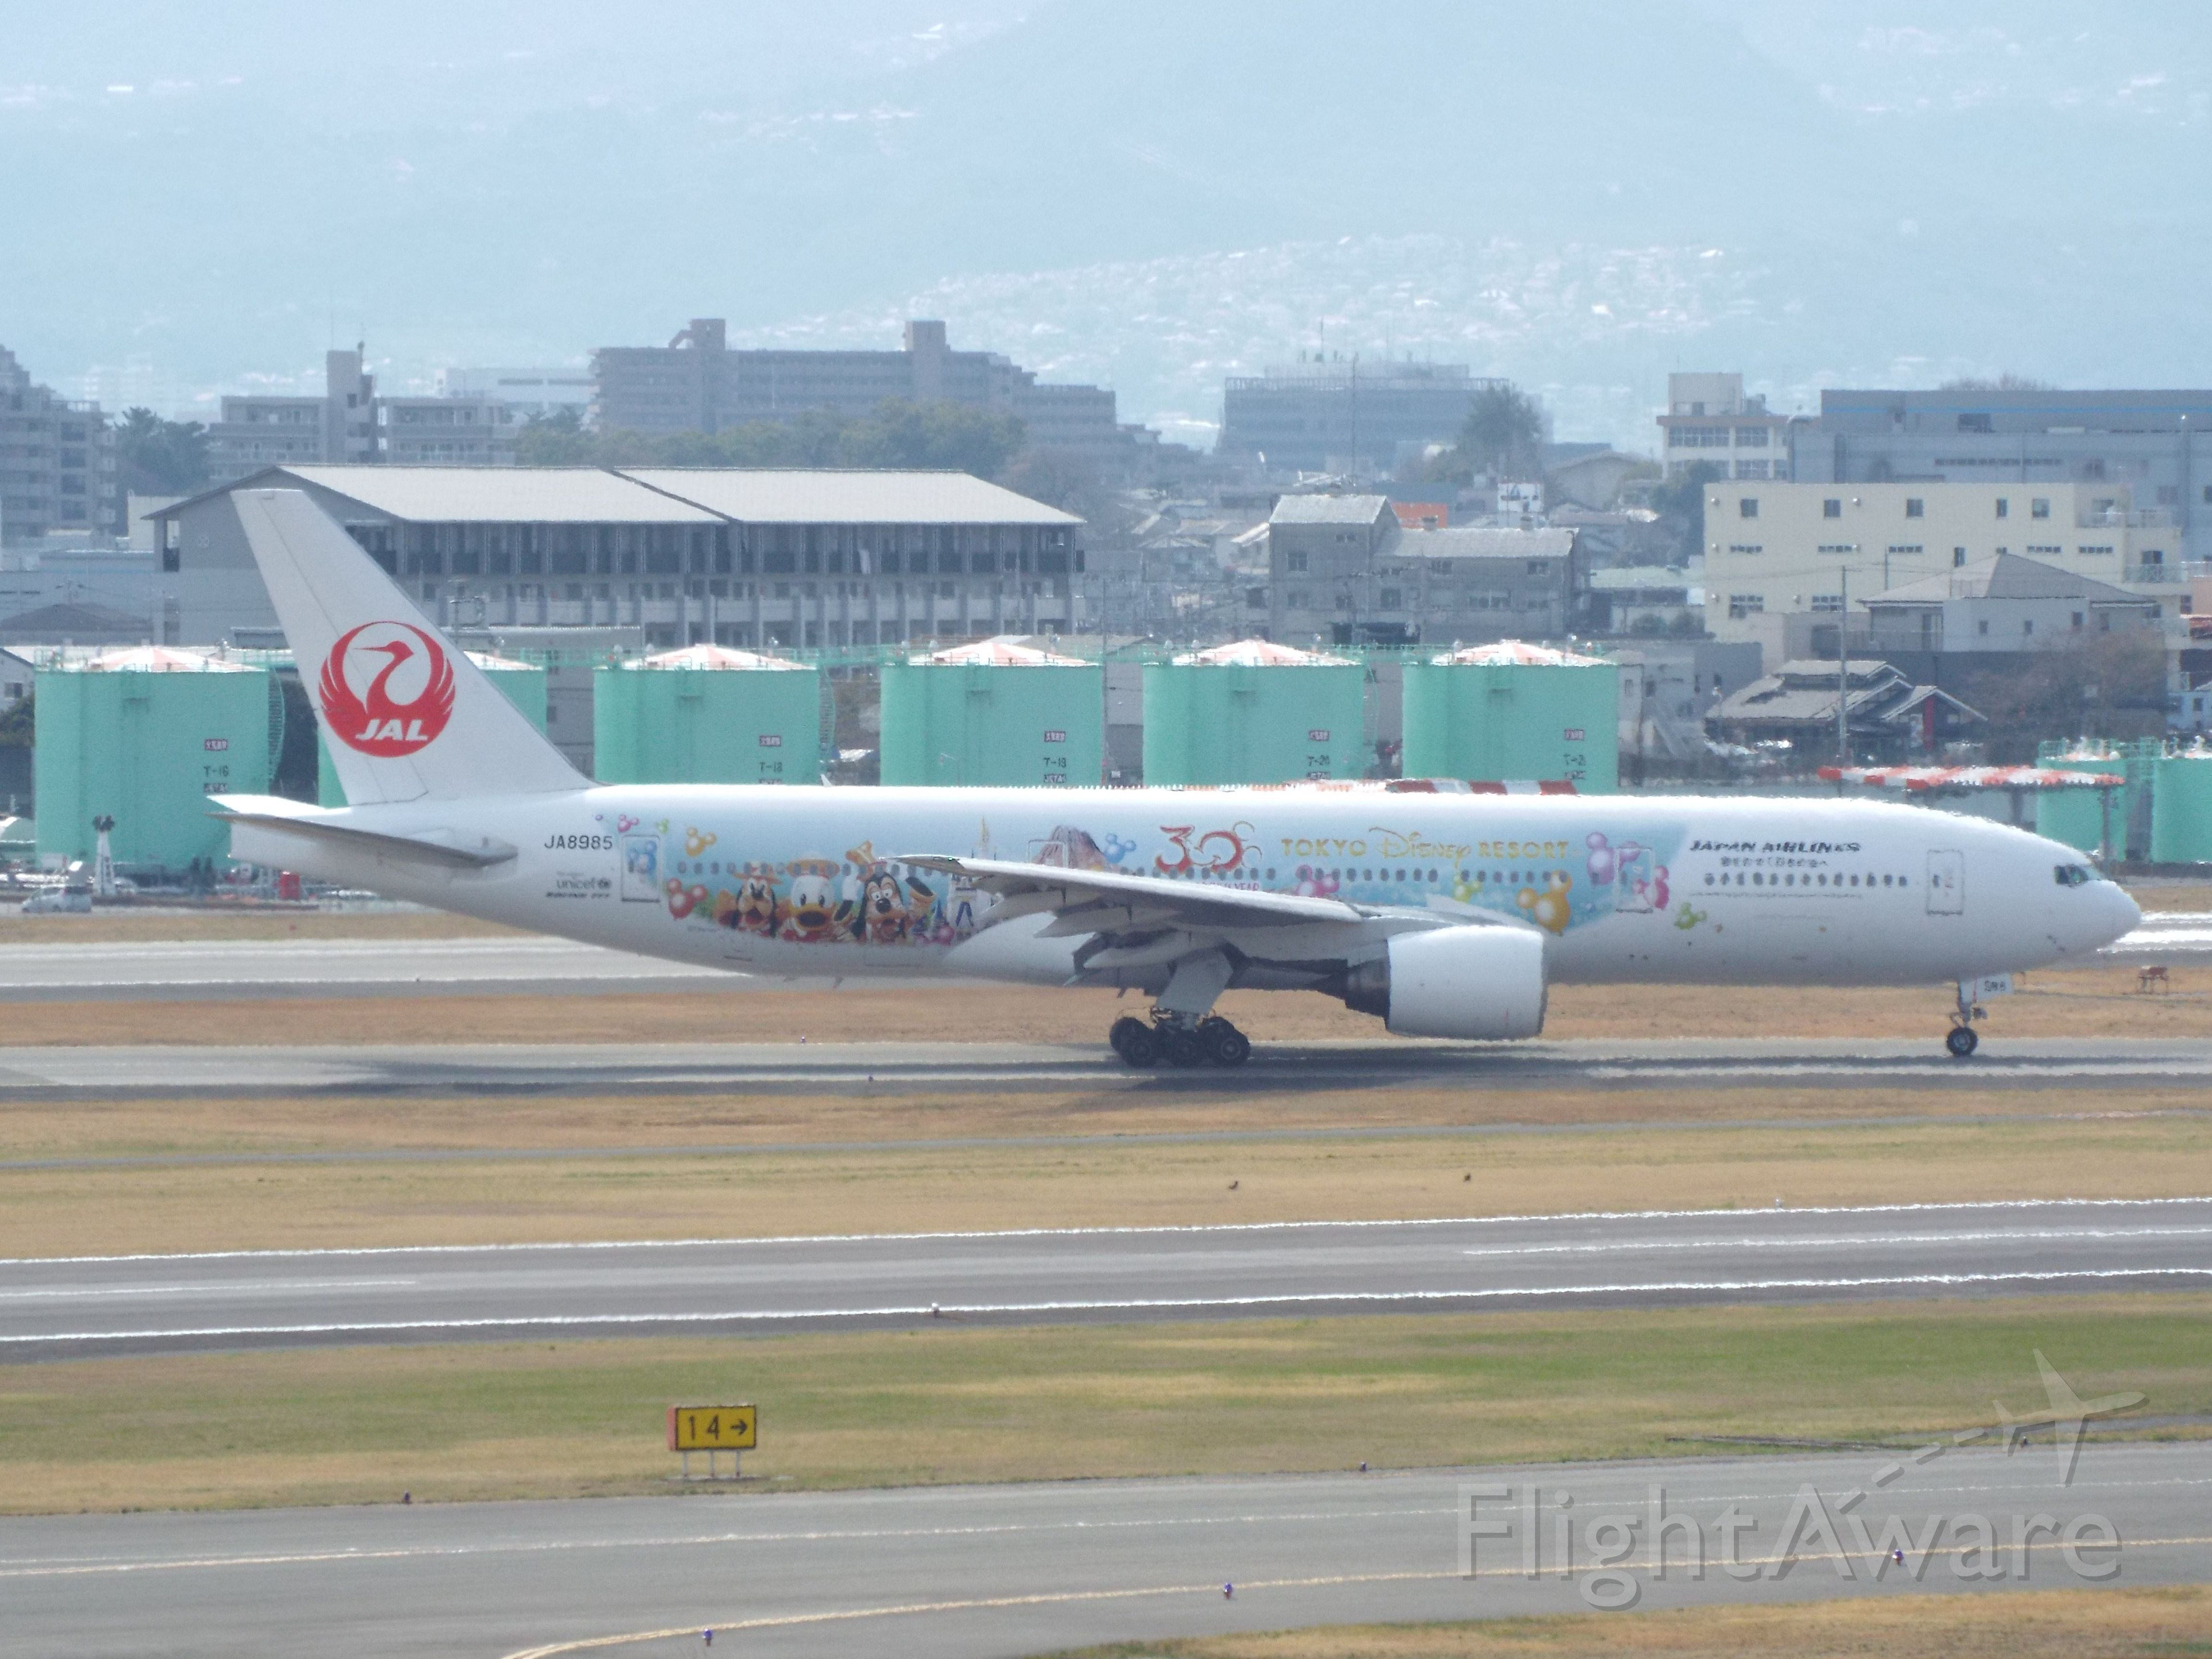 Boeing 777-200 (JA8985)